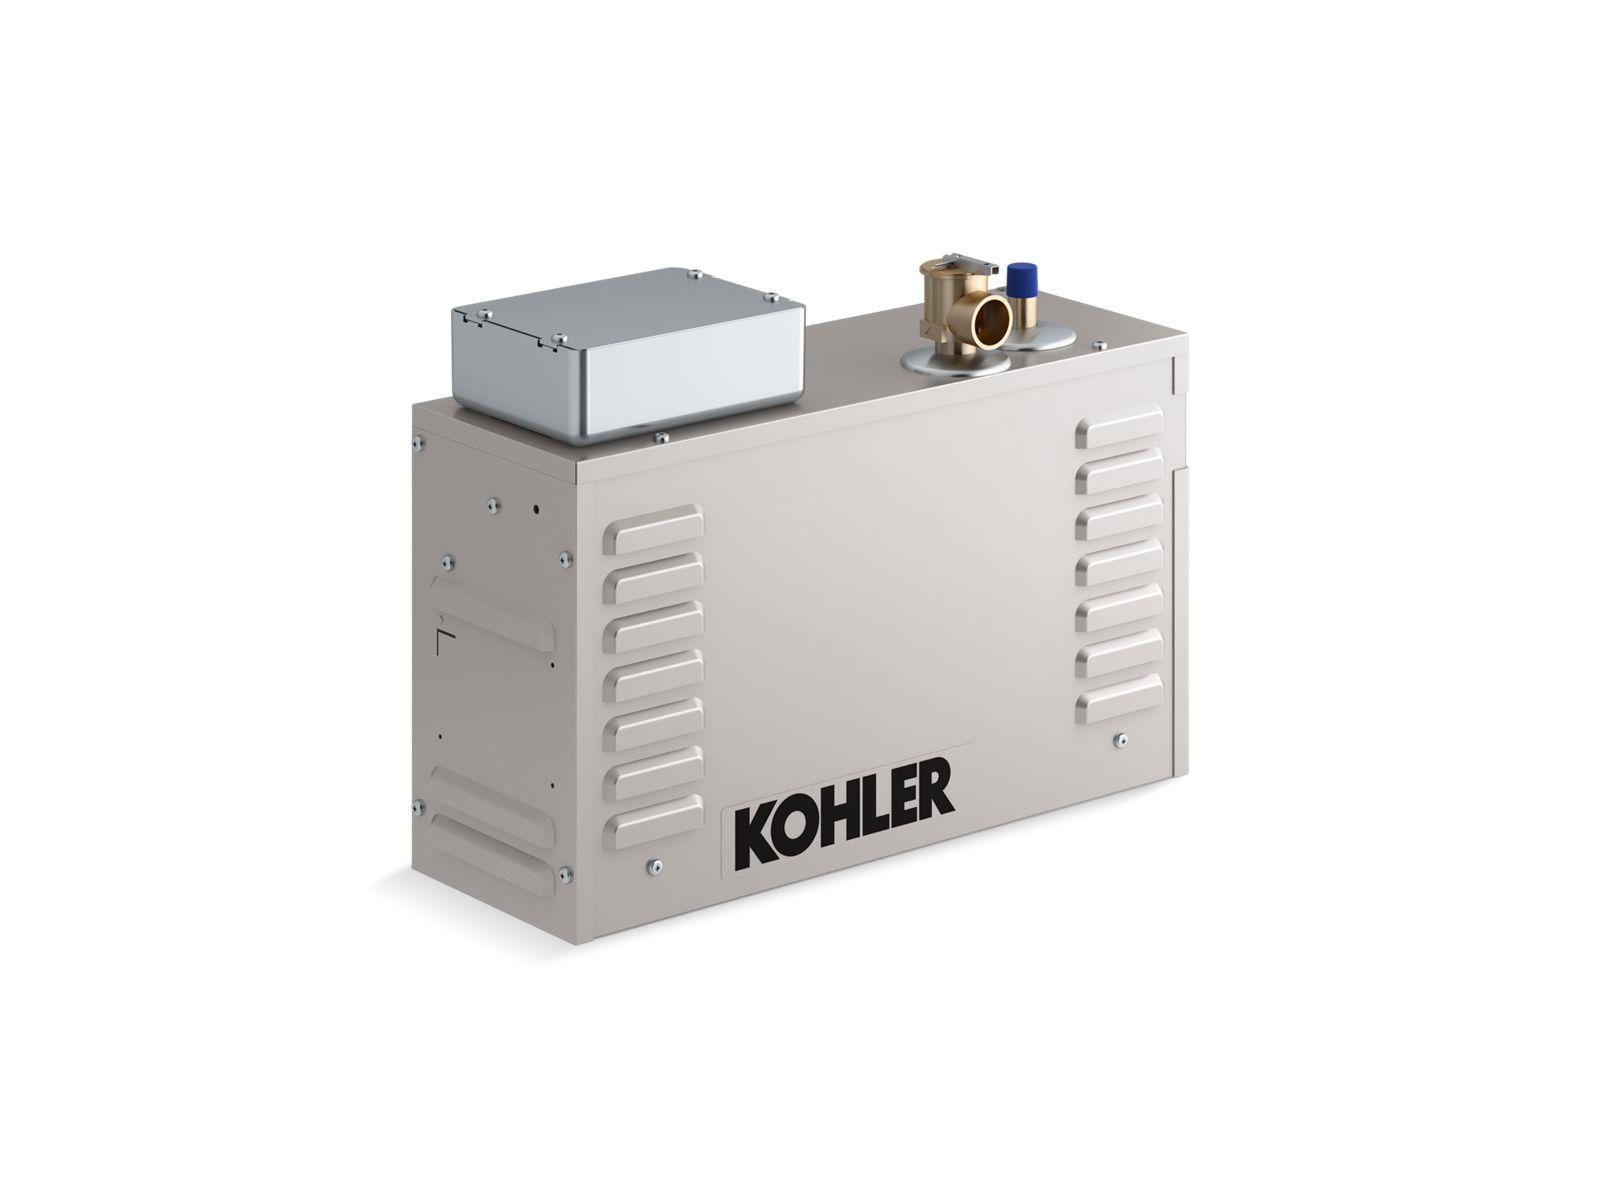 Kohler Steam Generator Wiring Diagram Libraries Genset